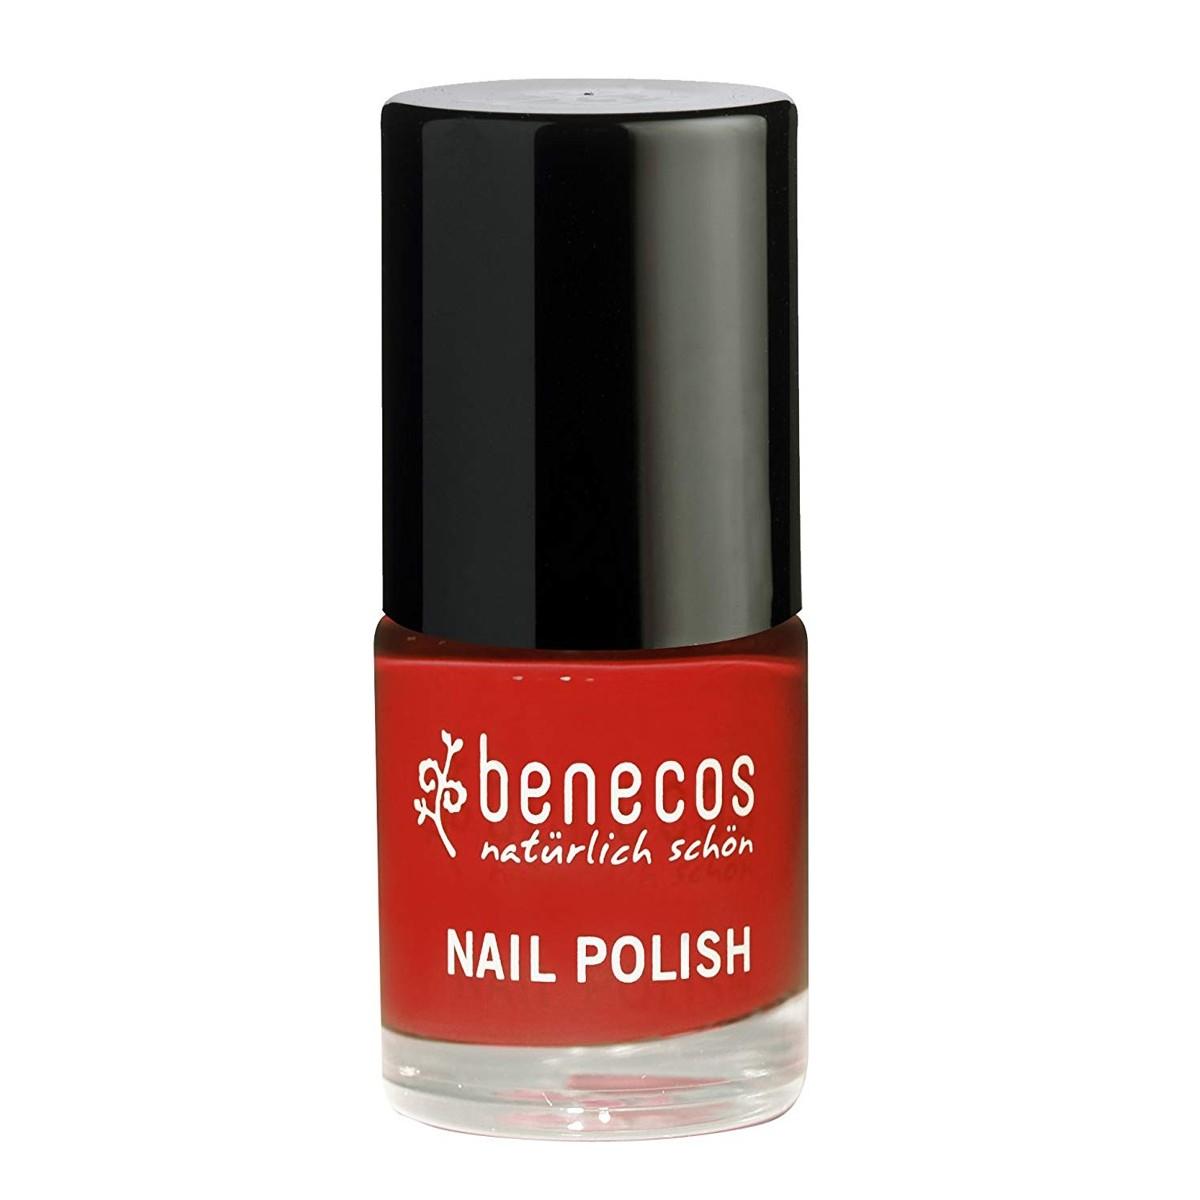 Benecos Nail Polish Vintage Red